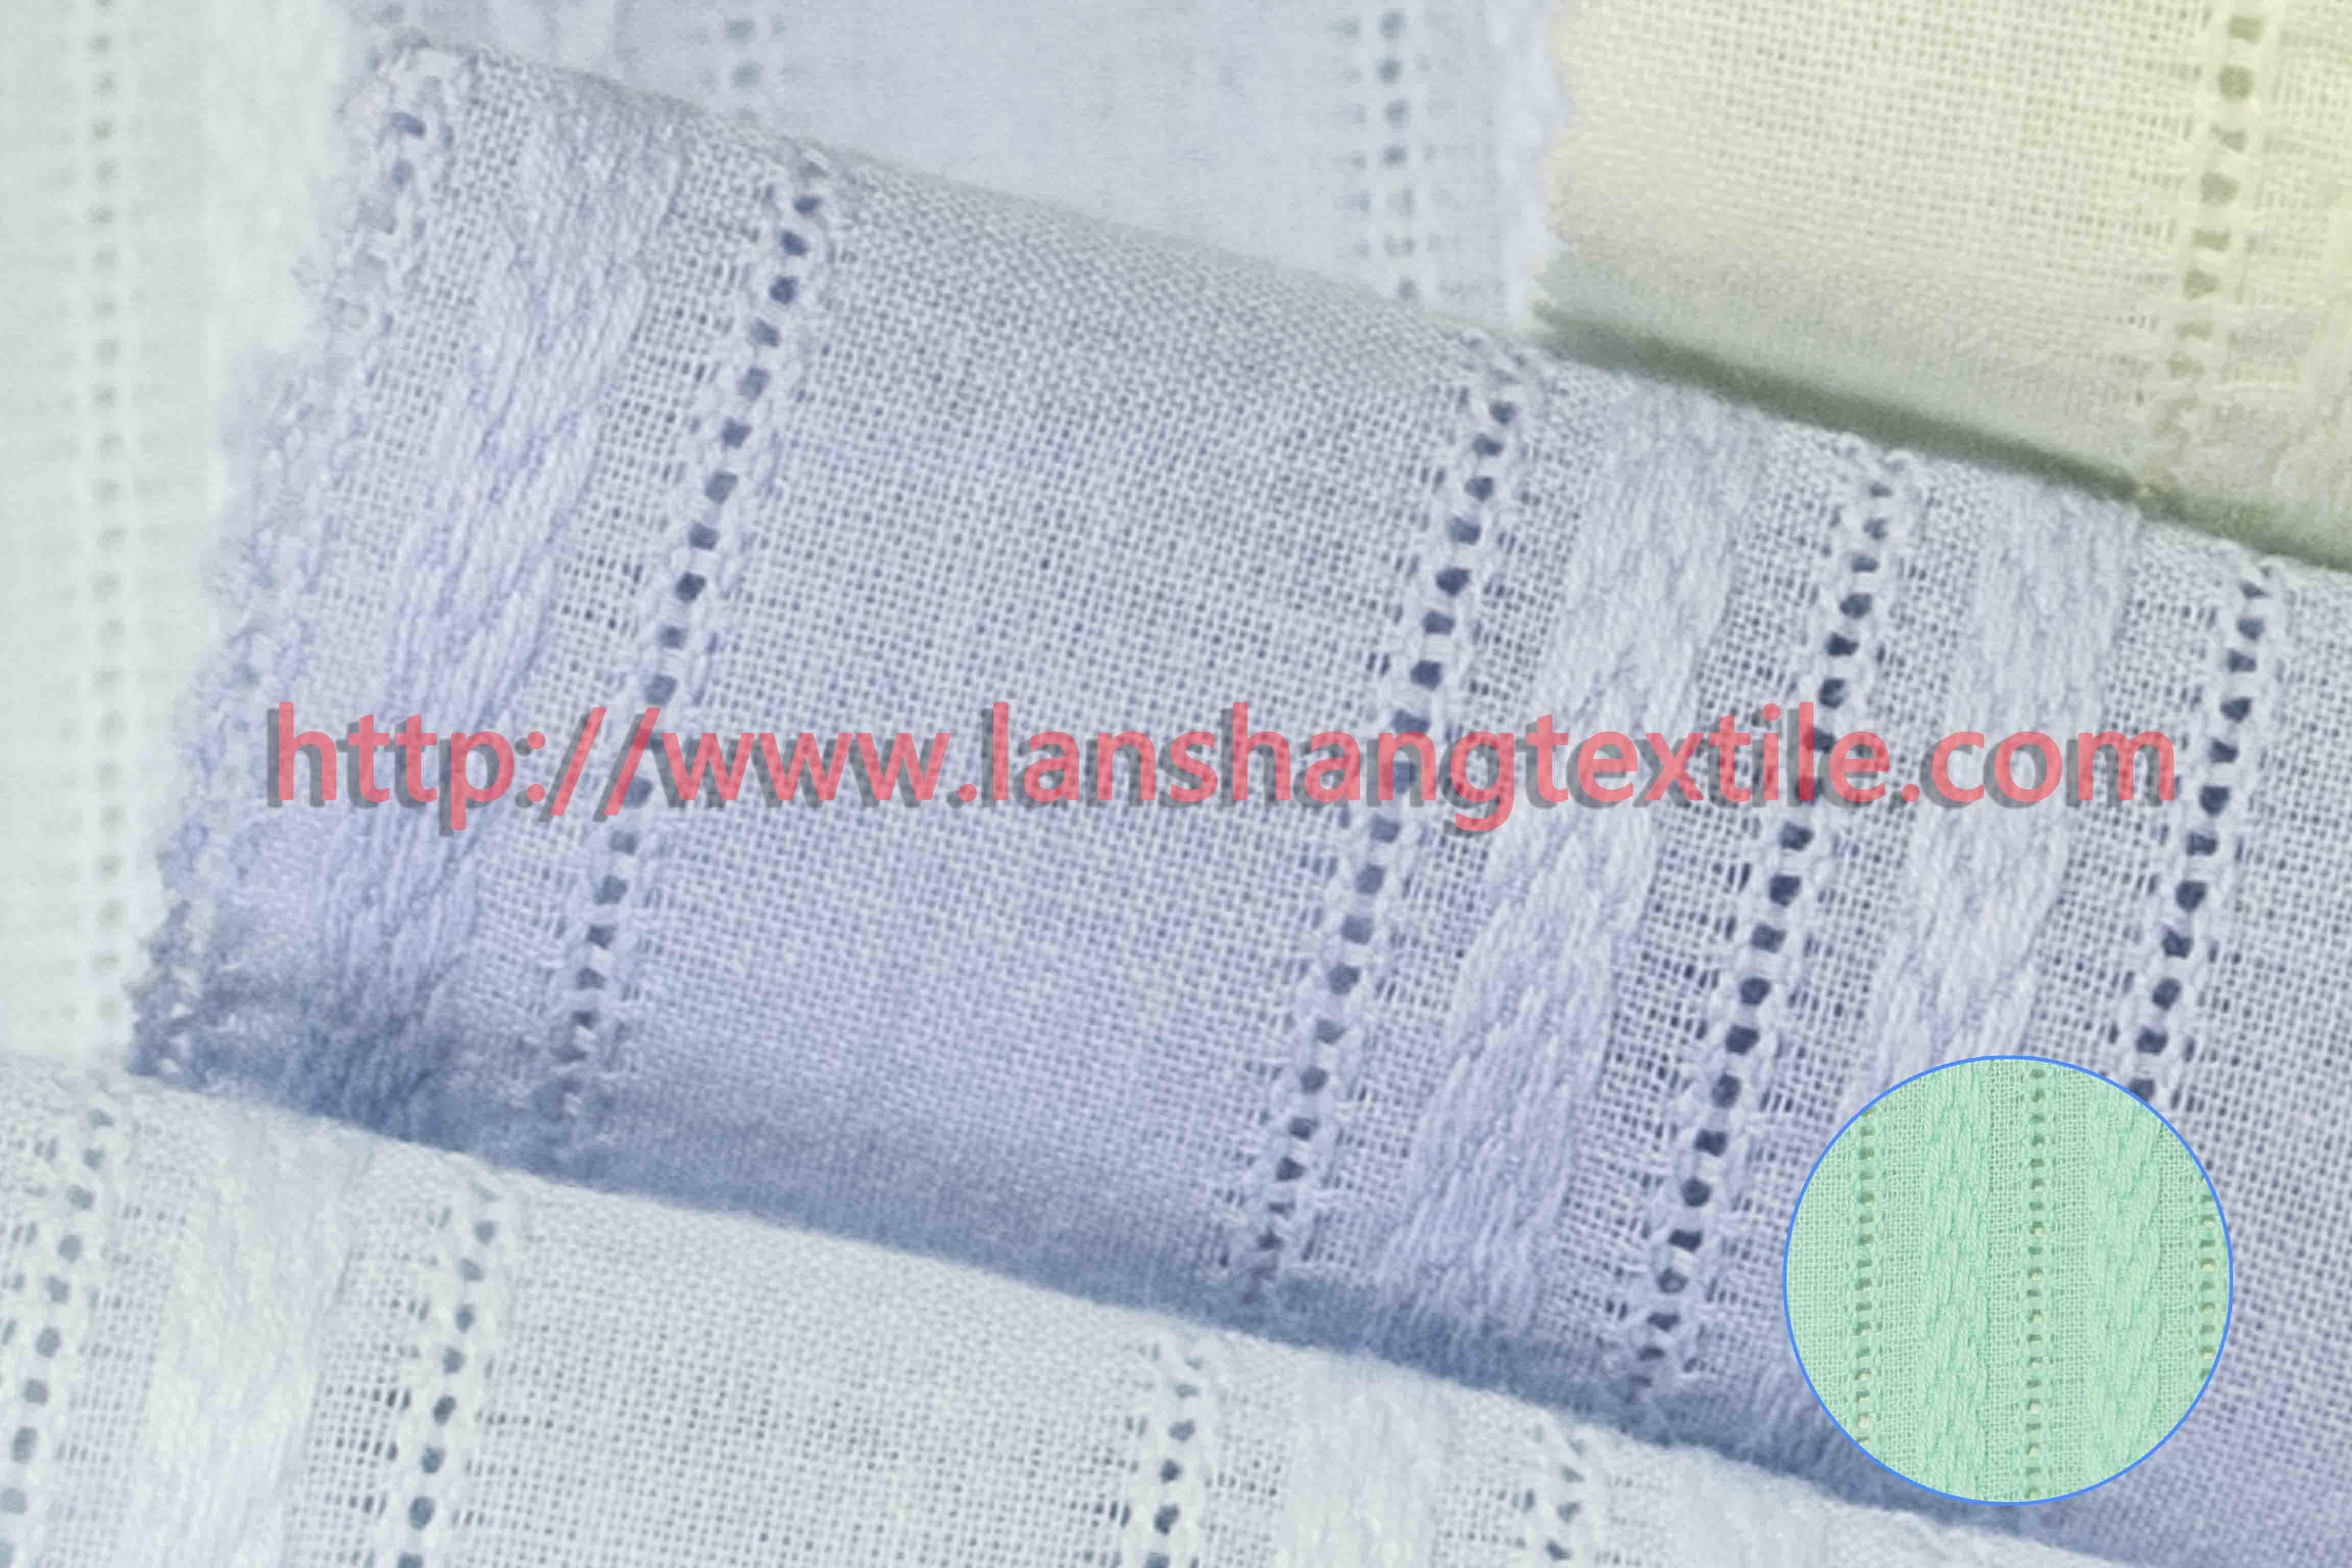 Dyed Jacquard Cotton Fabric for Woman Dress Shirt Garment Home Textile